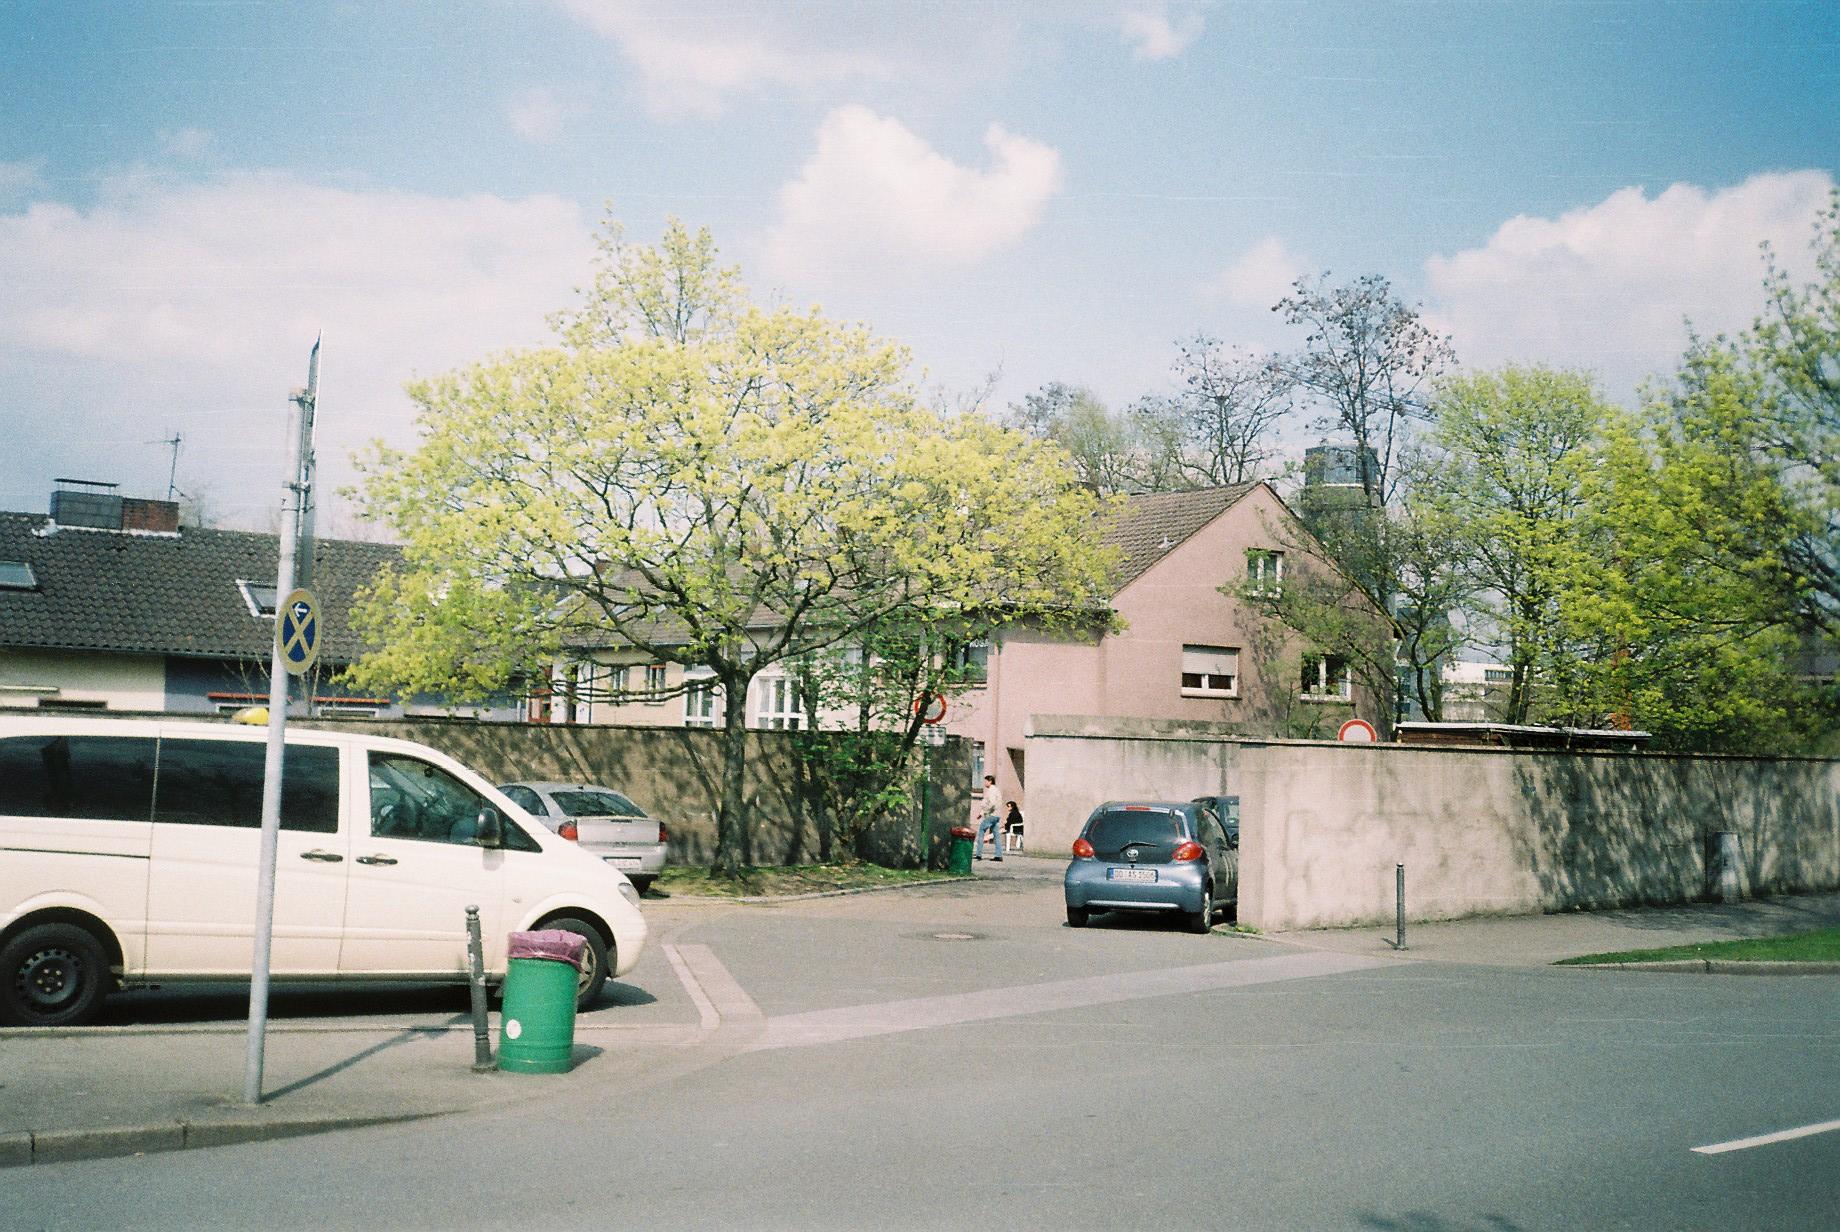 Red Light District of Essen